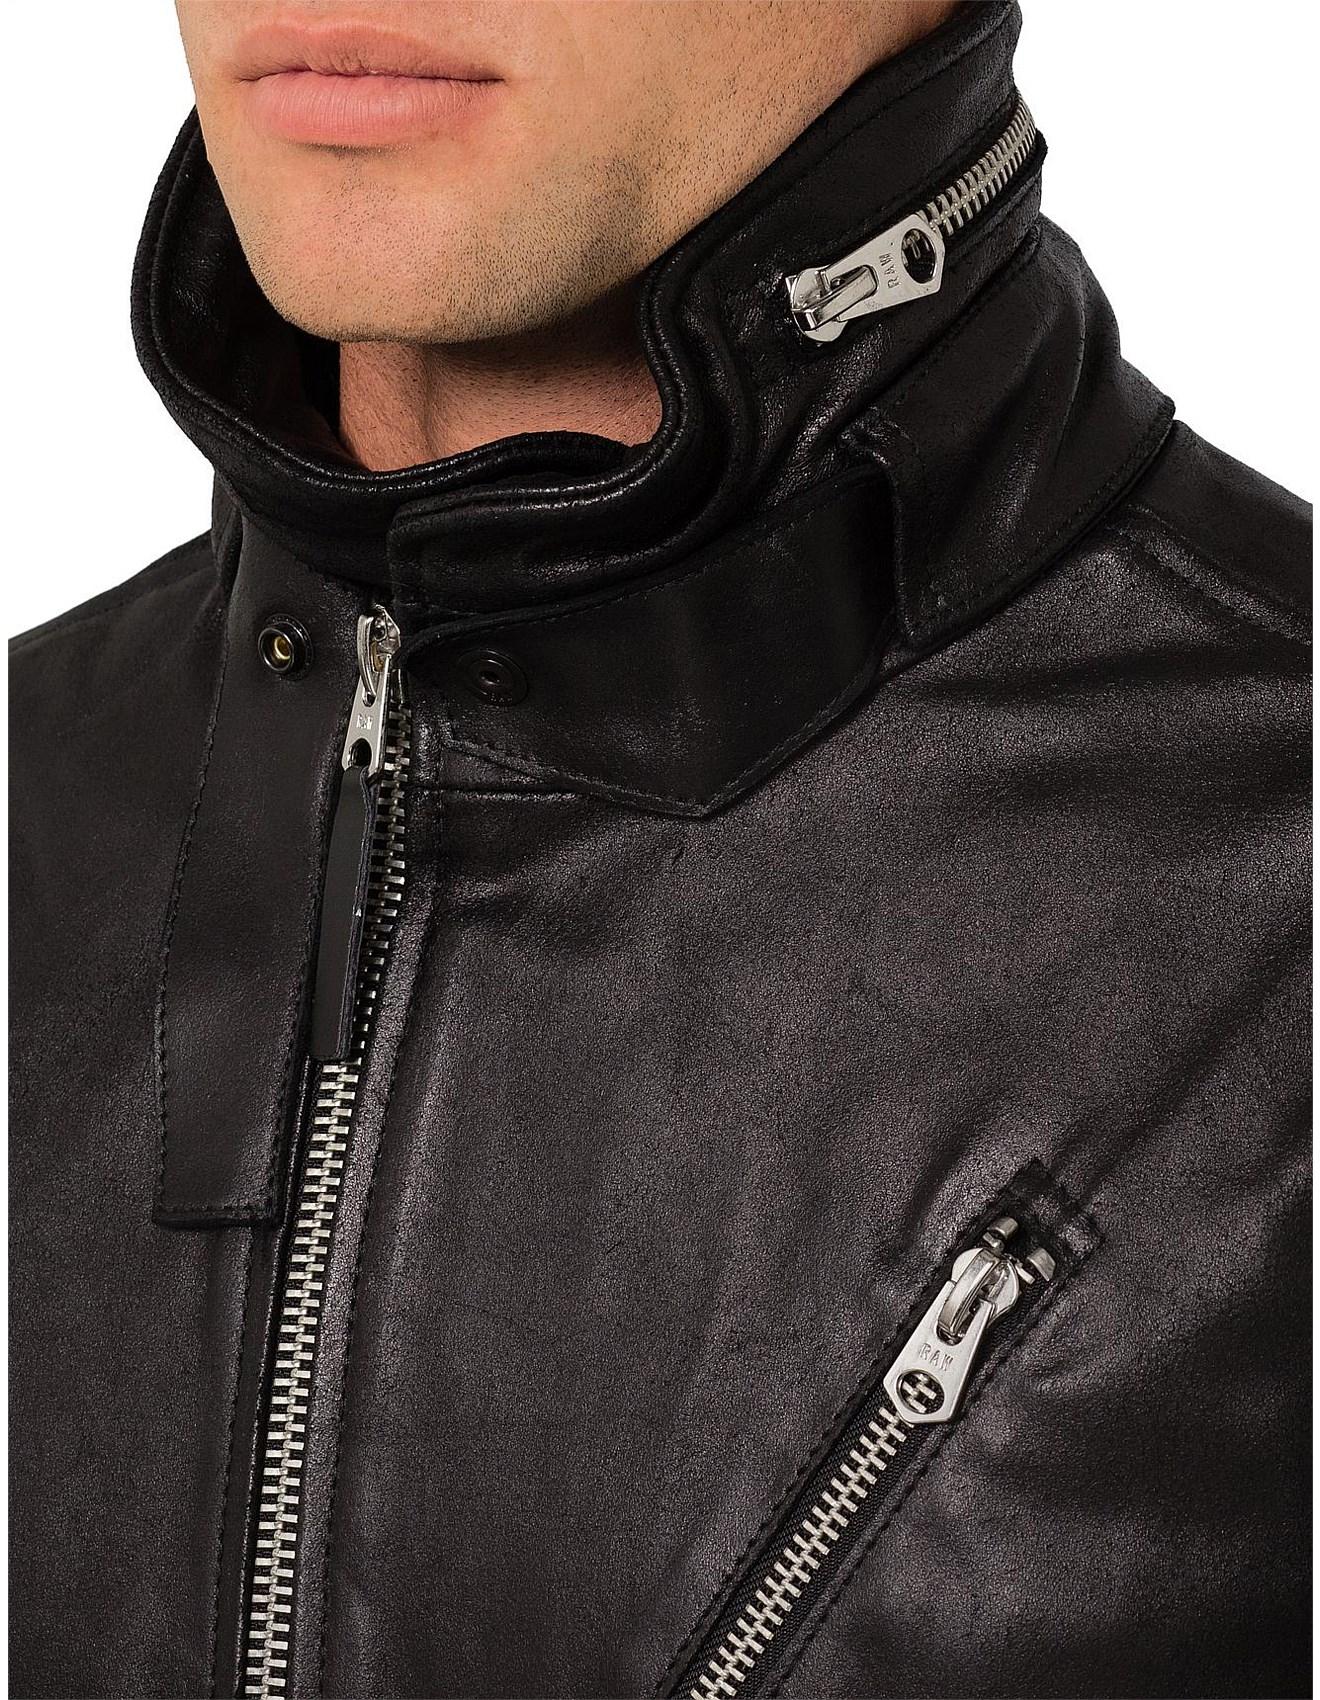 super popular pretty cool outlet on sale Empral 3D Leather Jacket